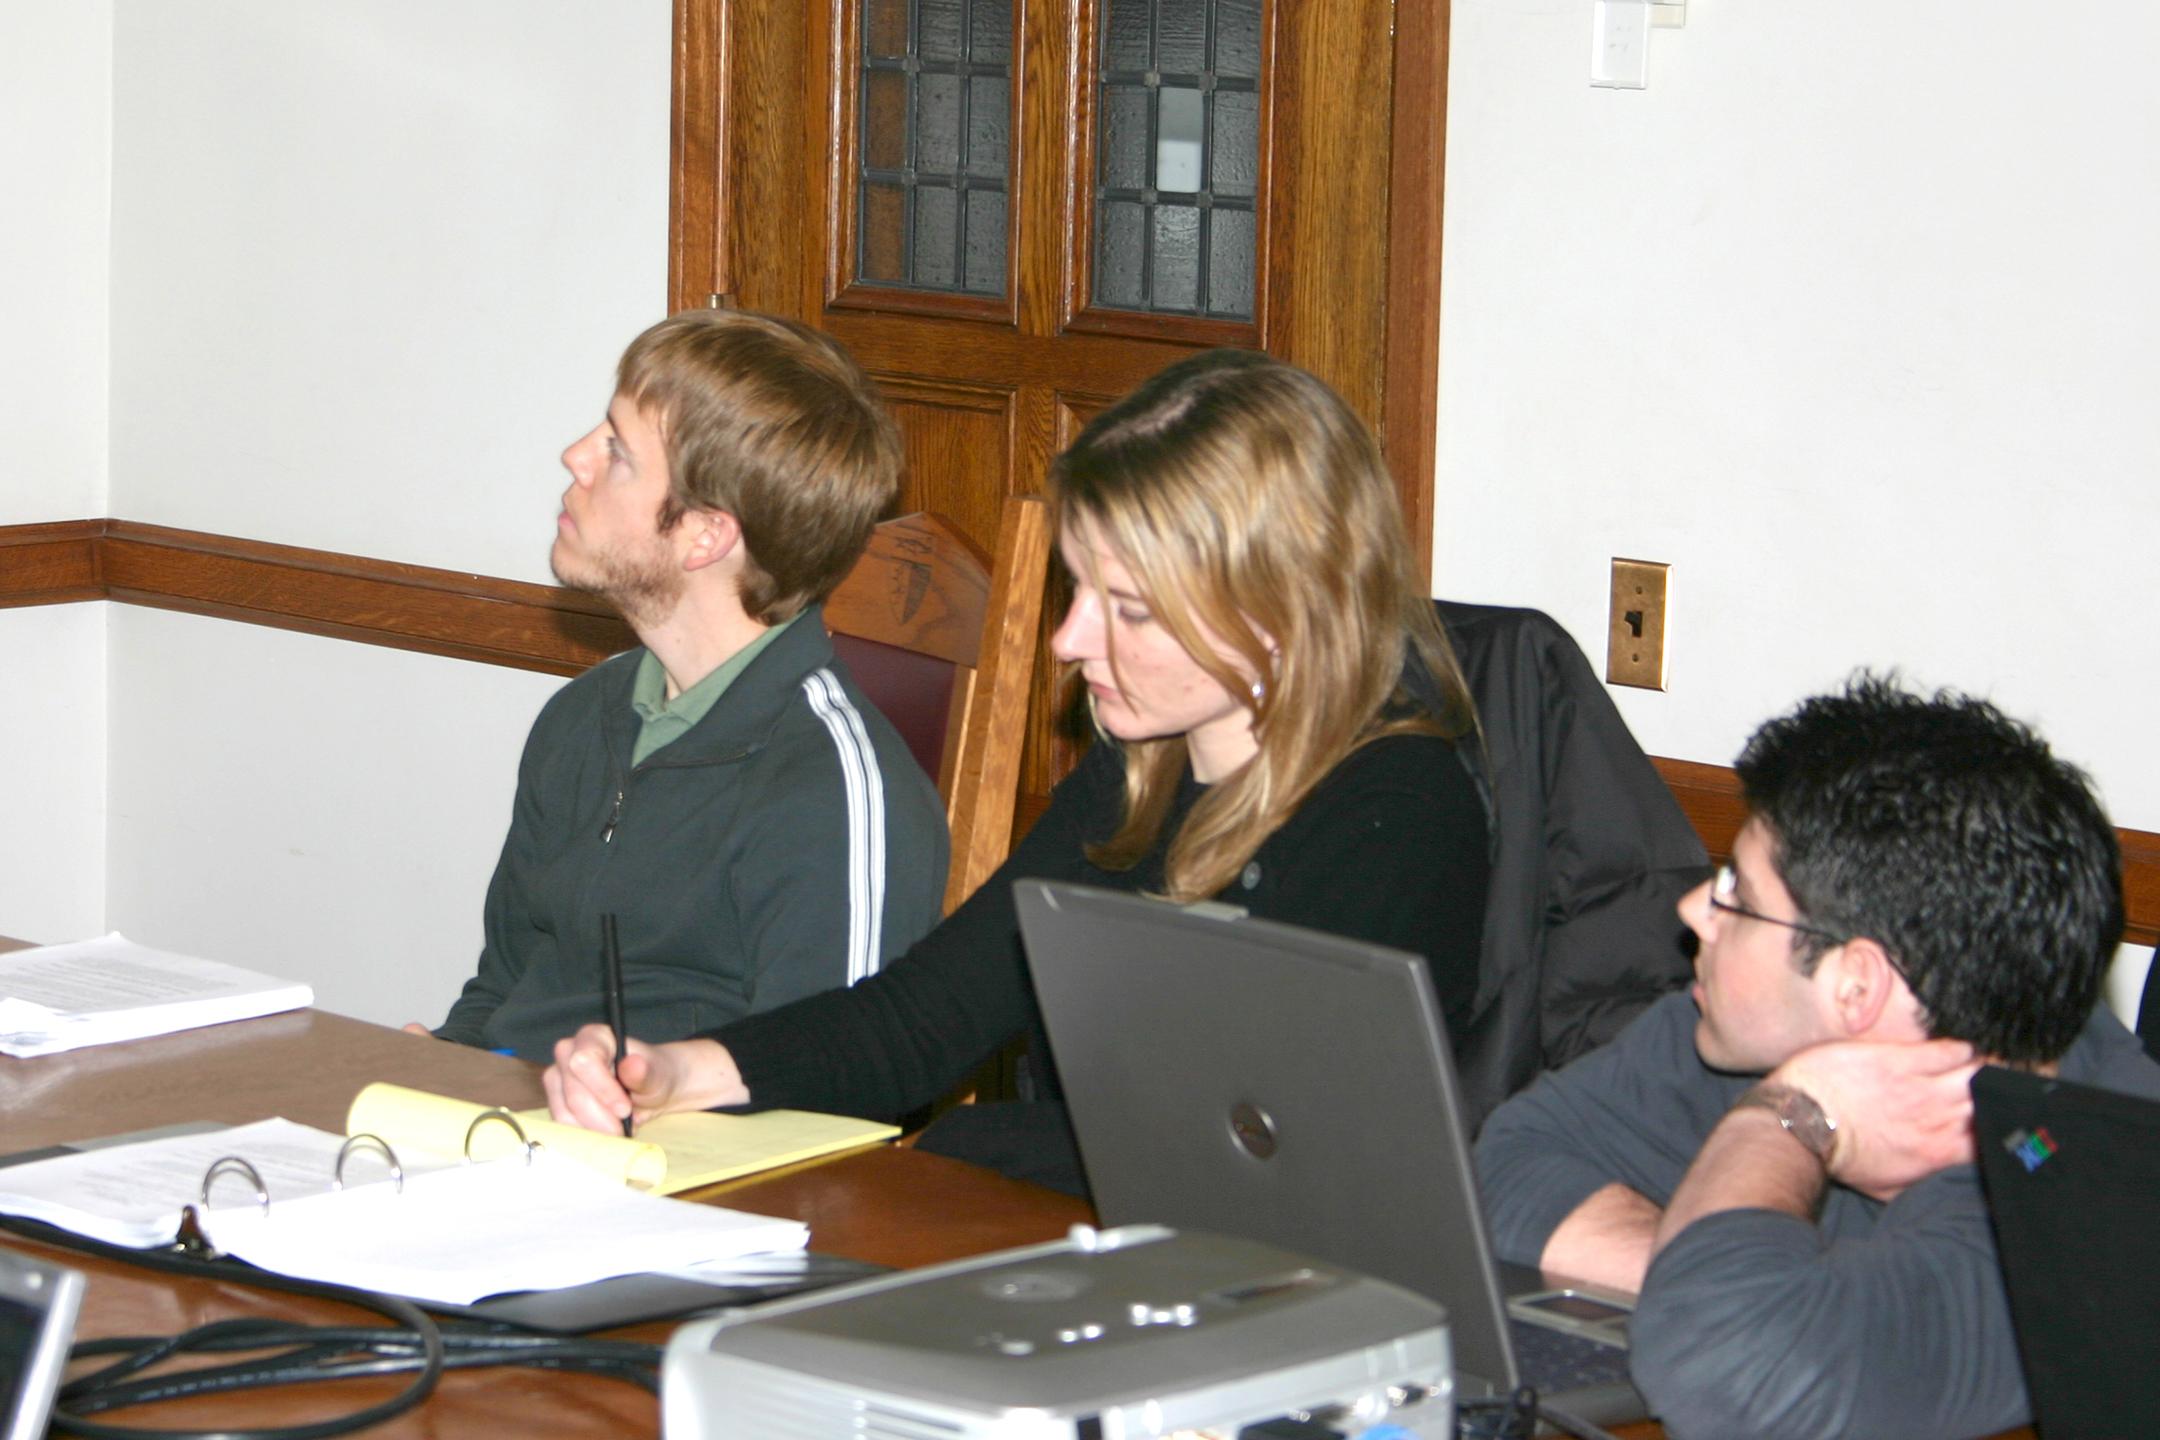 Sander Daniels '09, Giulia Good-Stefani '08, and Steven Winter '08